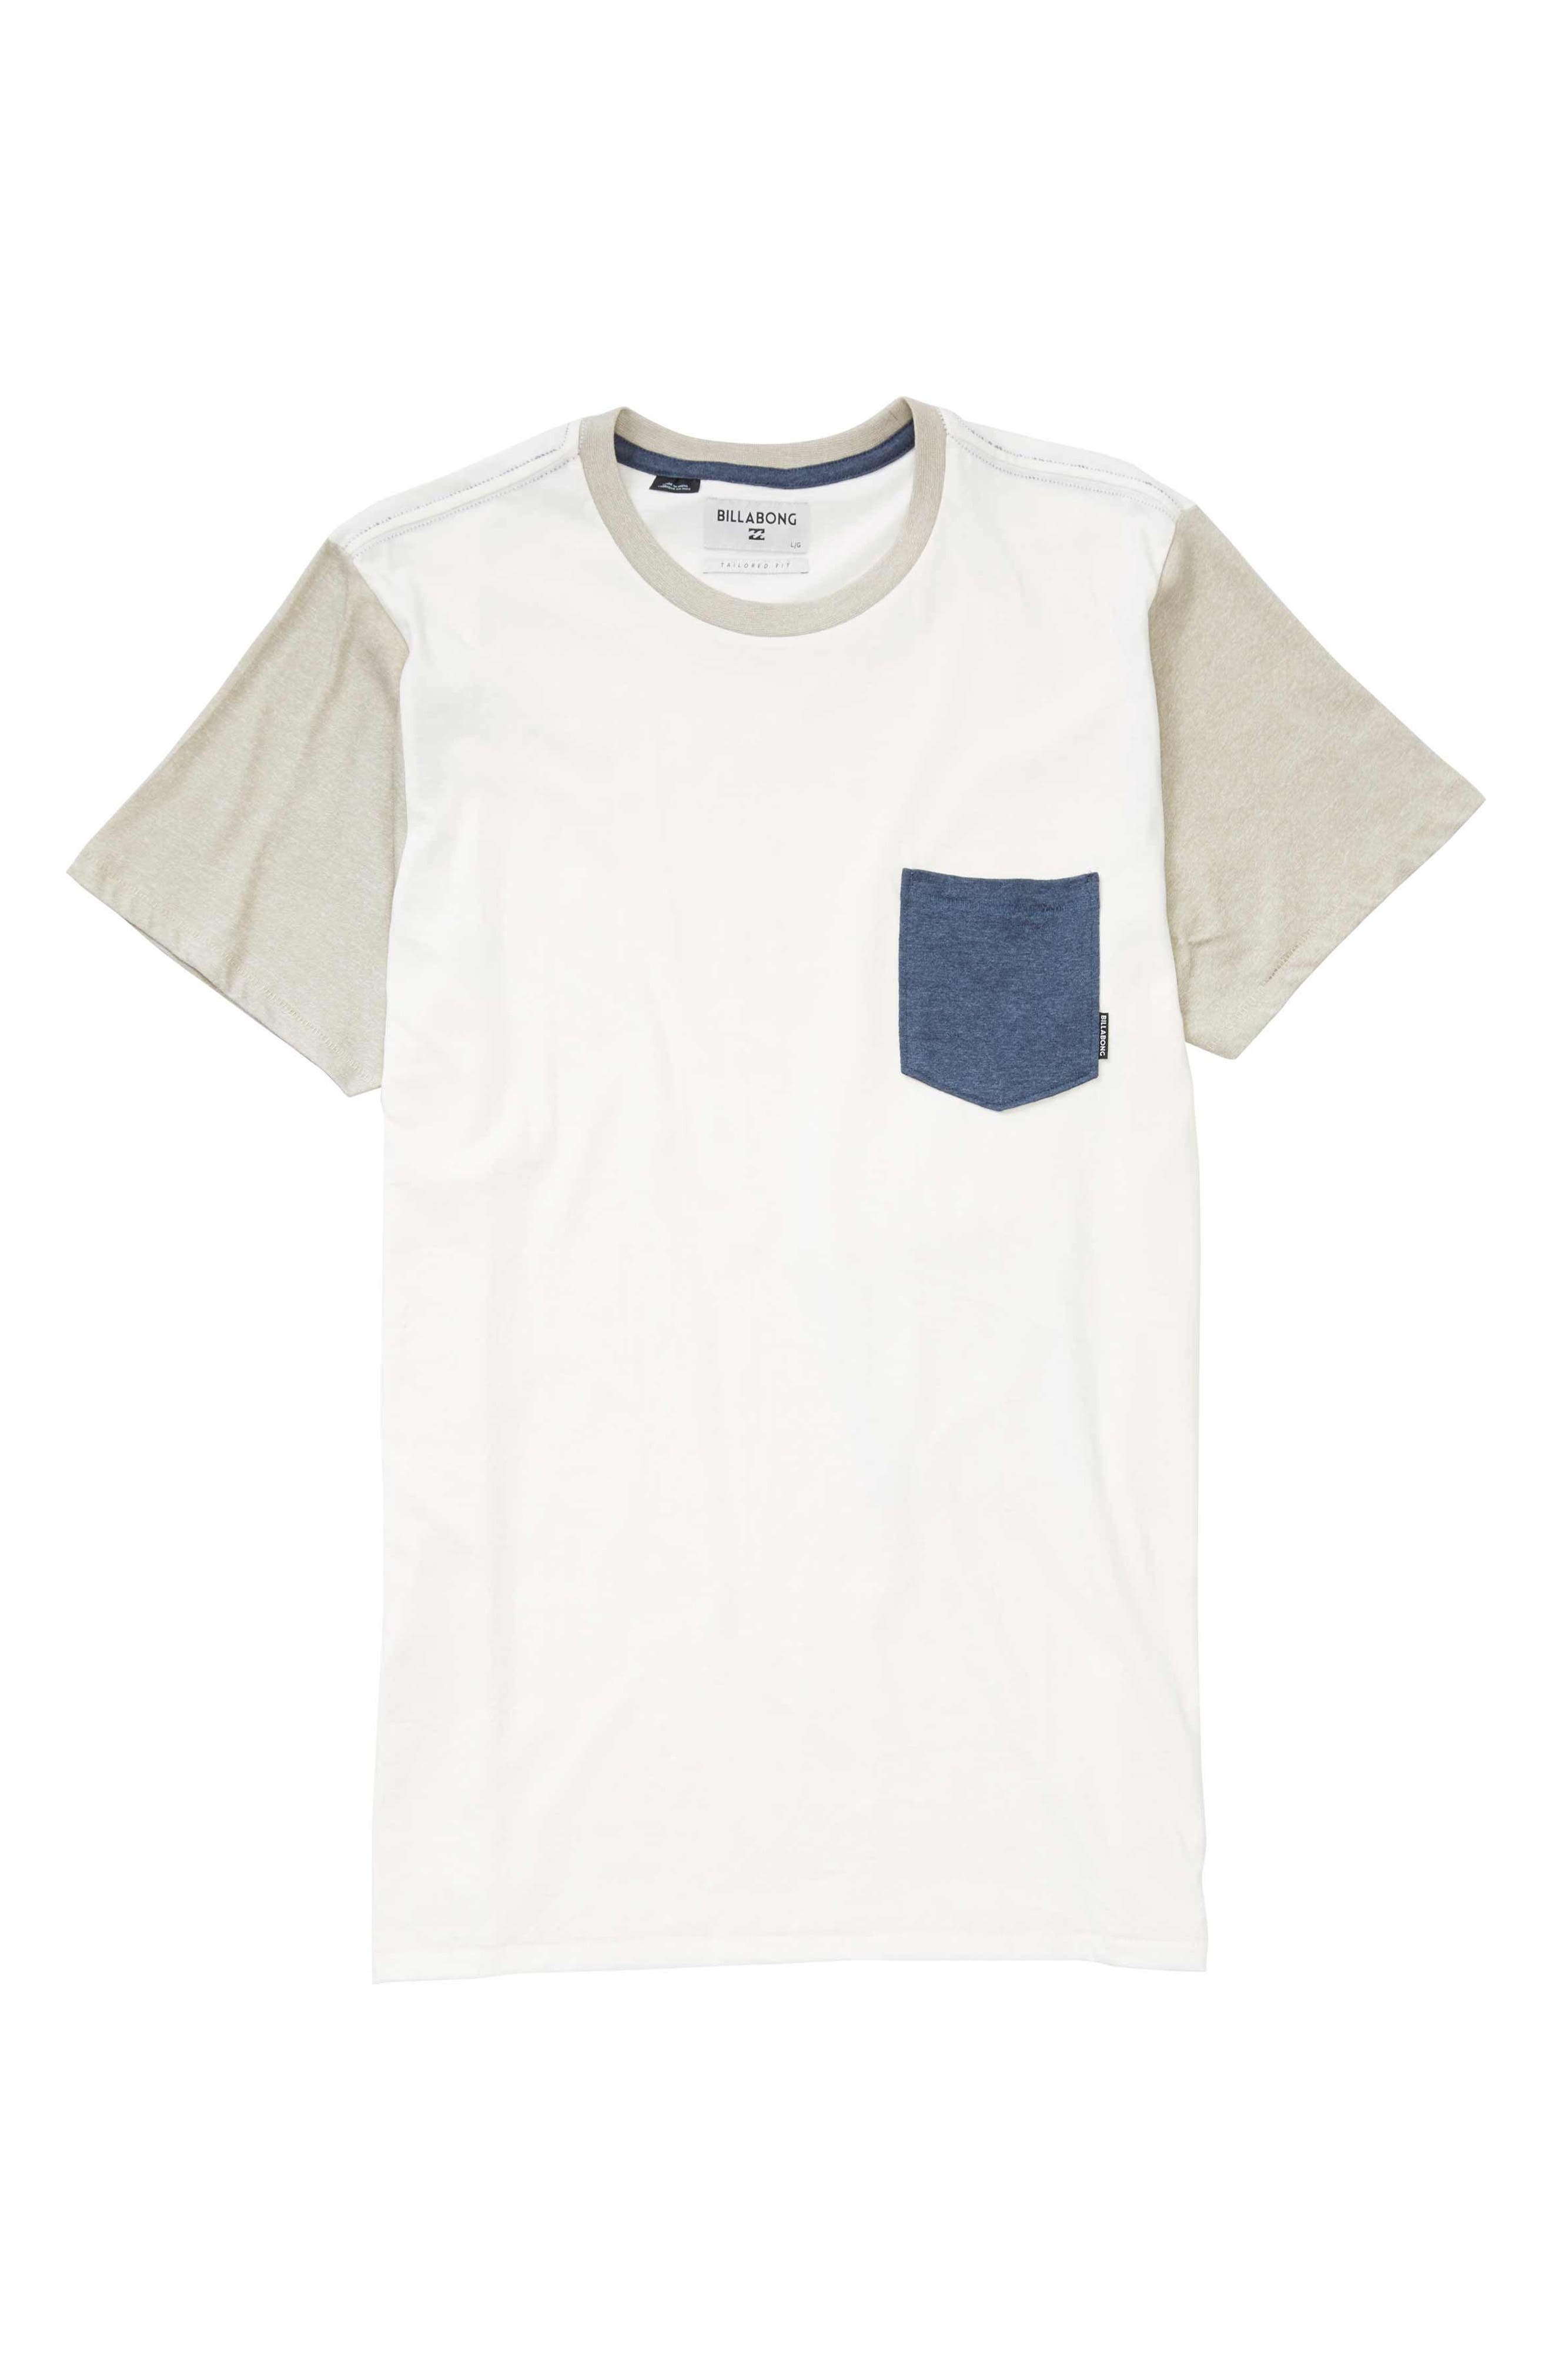 Billabong Zenith Pocket T-Shirt (Toddler Boys, Little Boys & Big Boys)